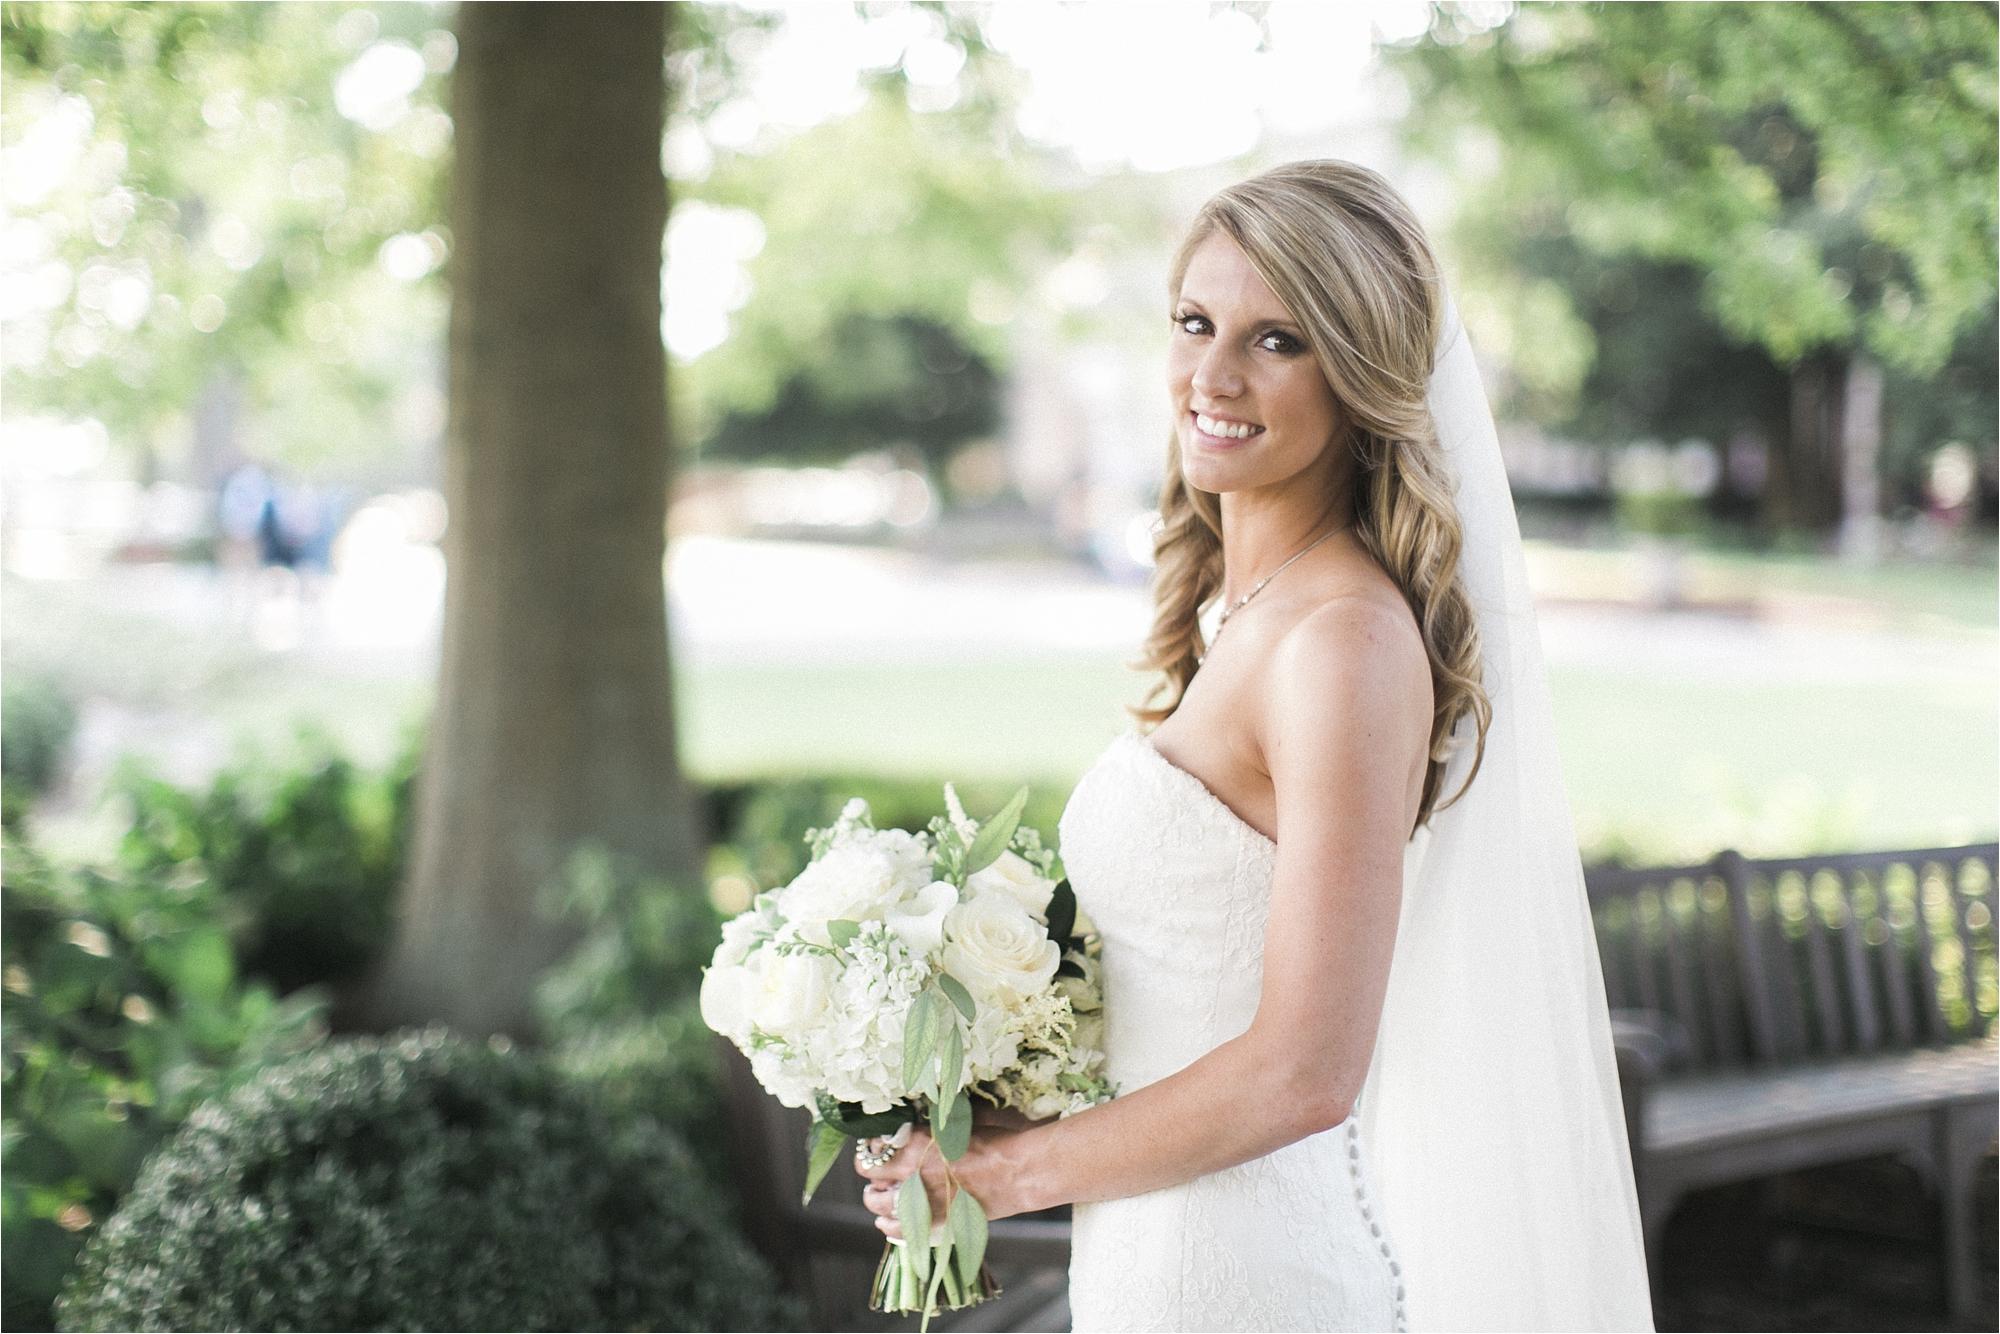 stephanie-yonce-photography-richmond-virginia-country-club-wedding_0032.jpg